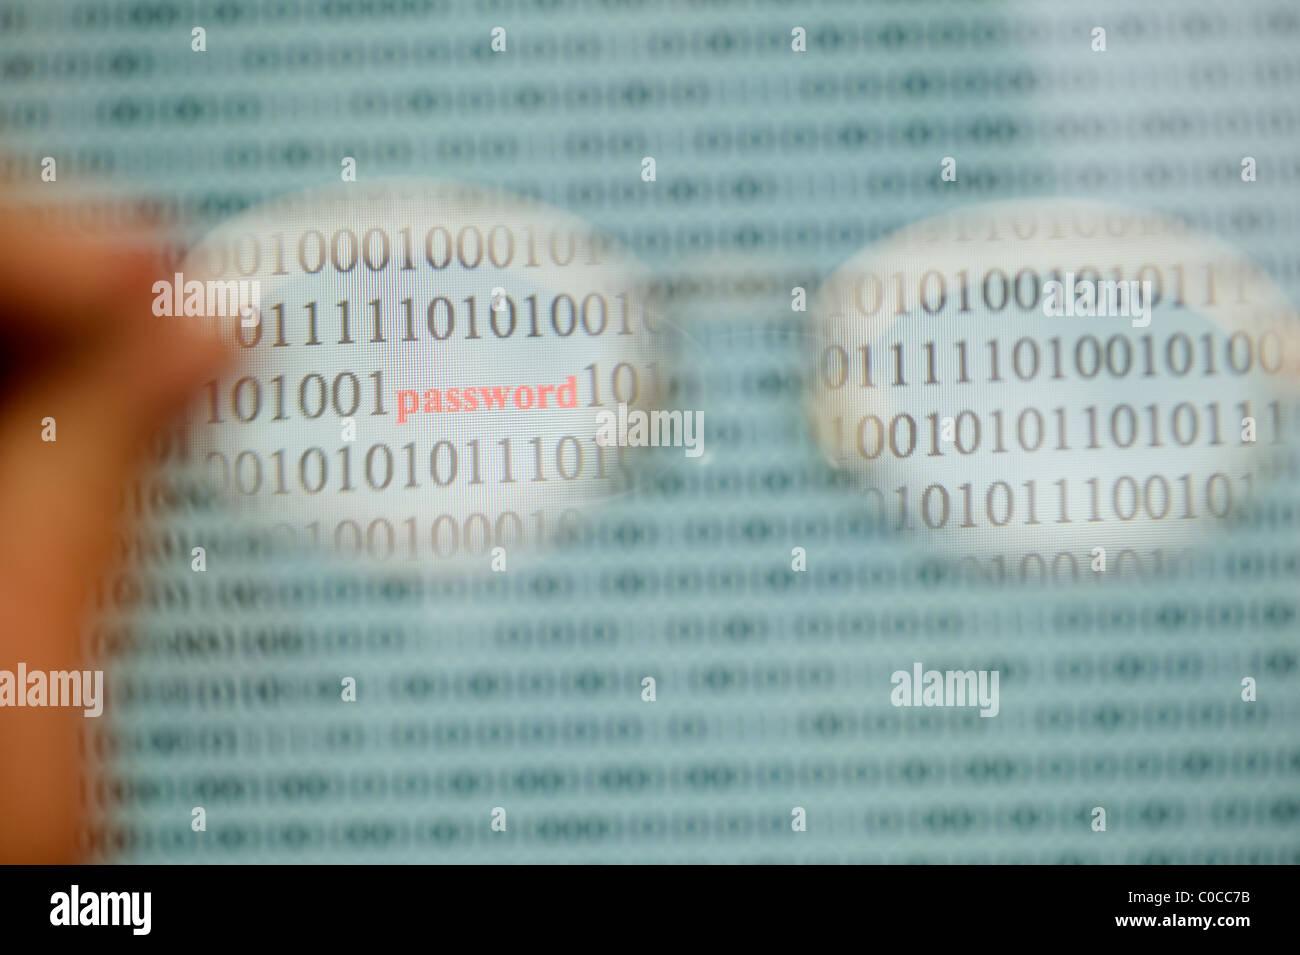 password computer - Stock Image